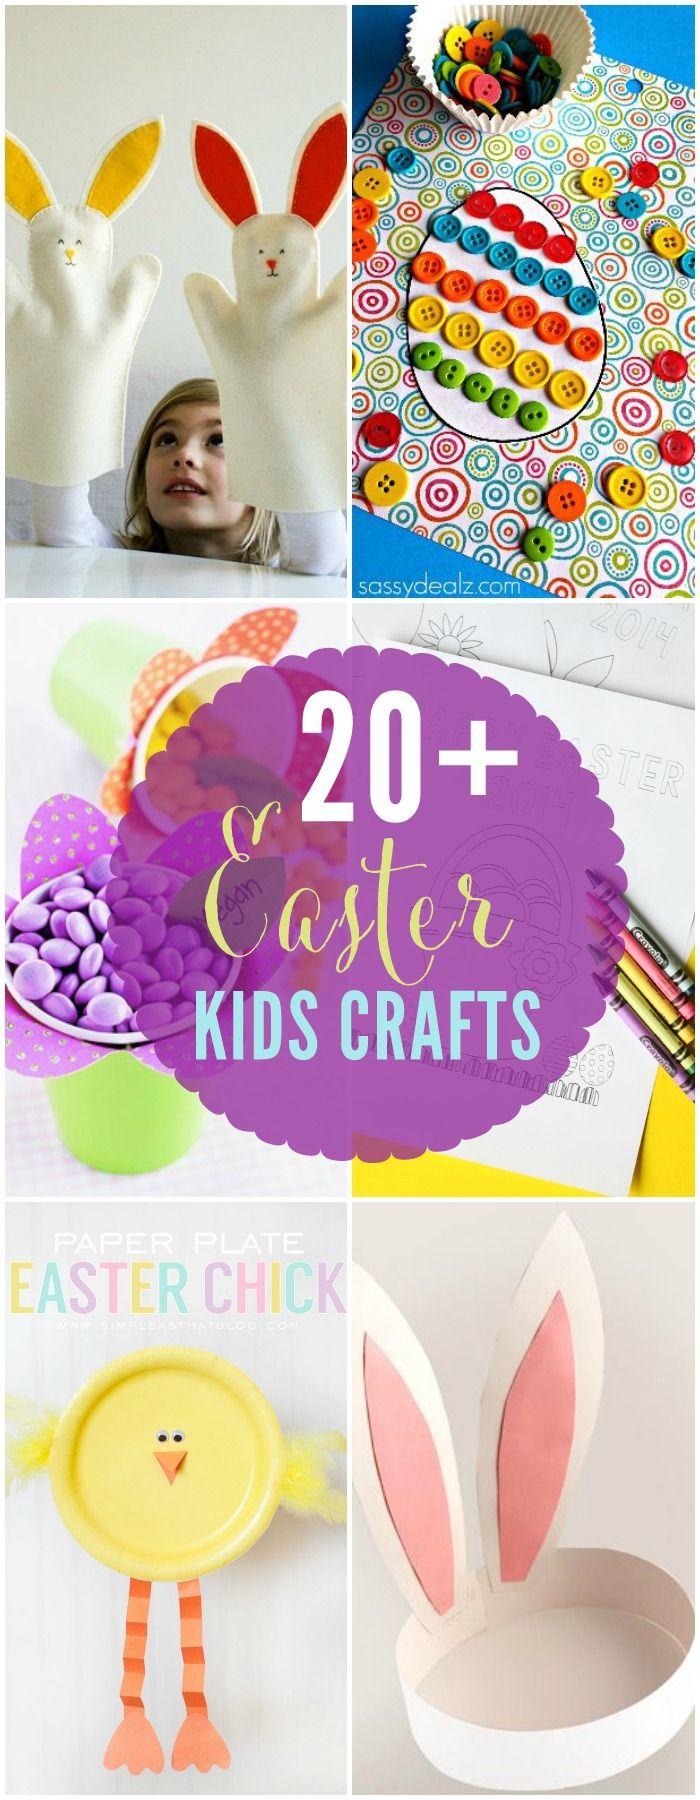 20+ Easter Kids Crafts - great collection on { lilluna.com }